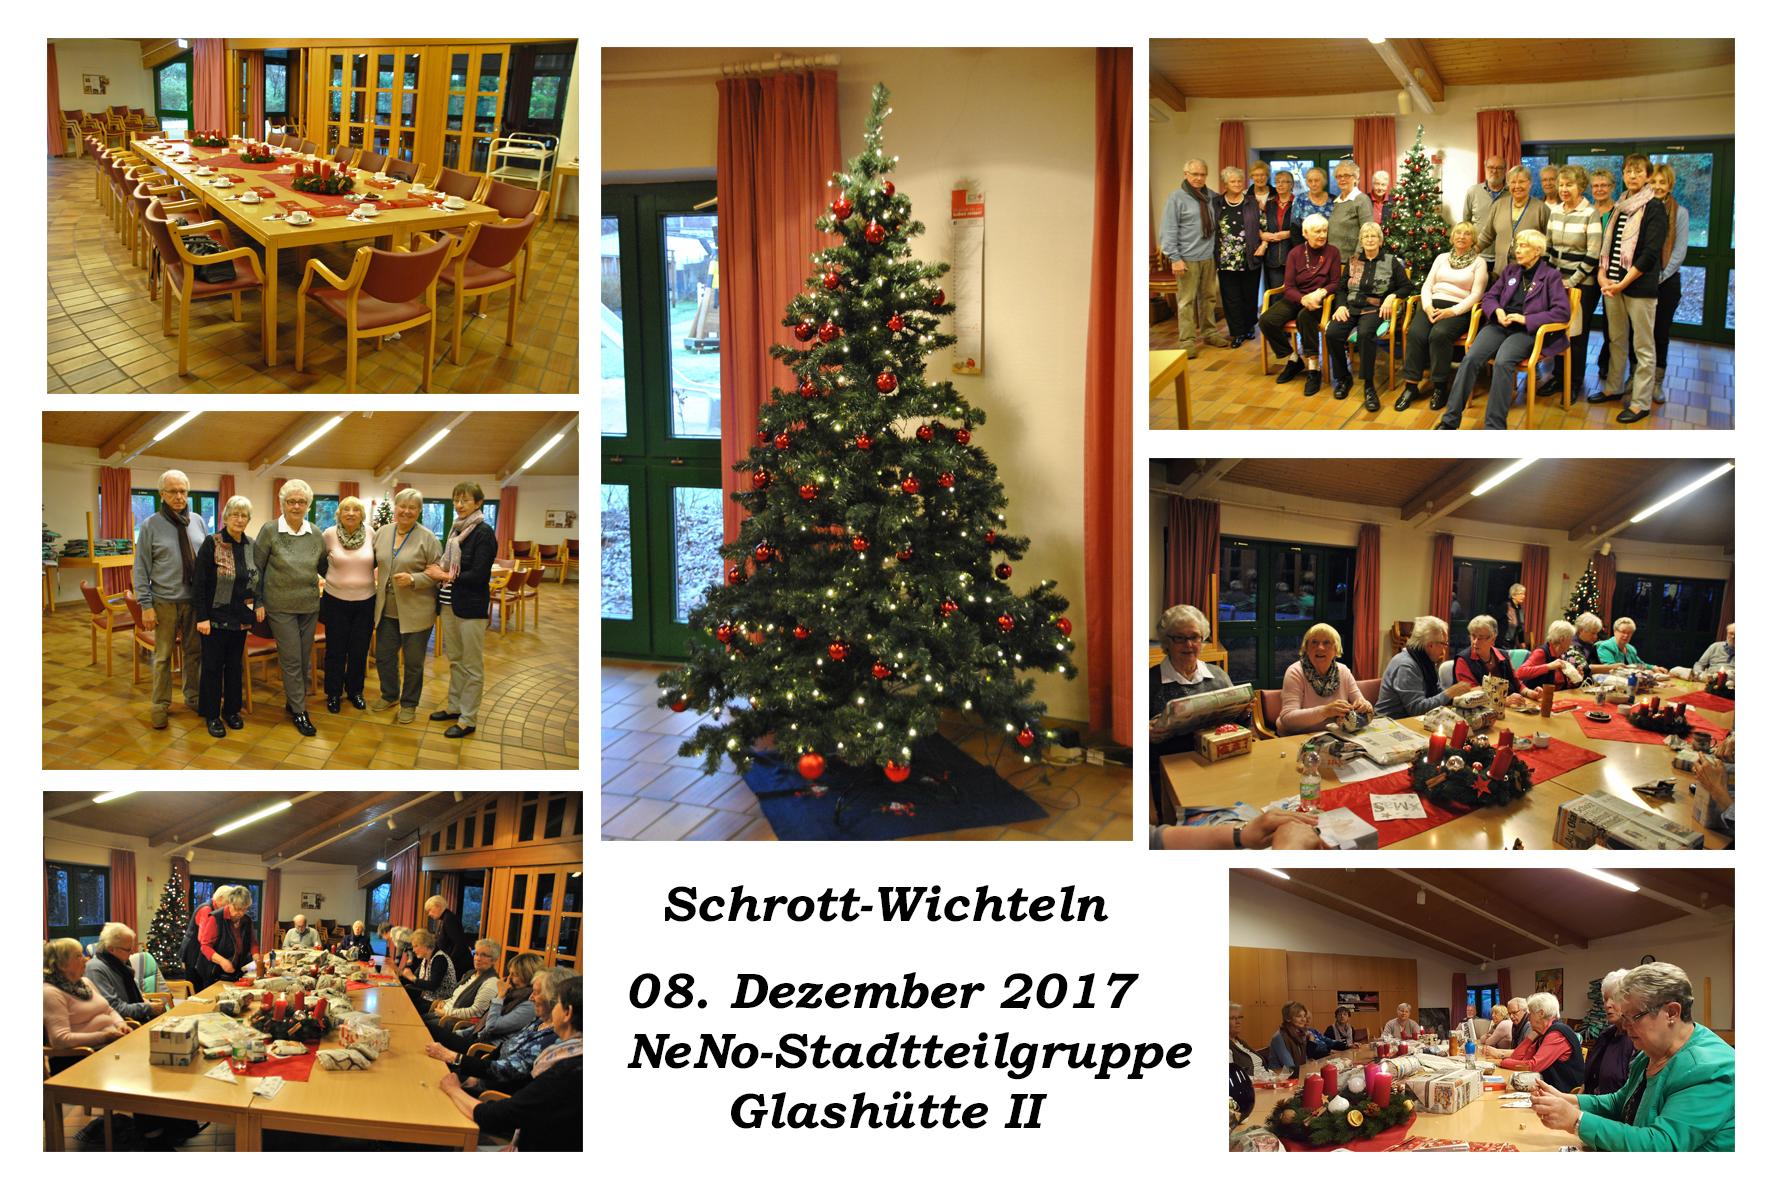 NeNo/Glashütte 2: Schrott-Wichteln, 08.12.2017 (Fotos: Tom)